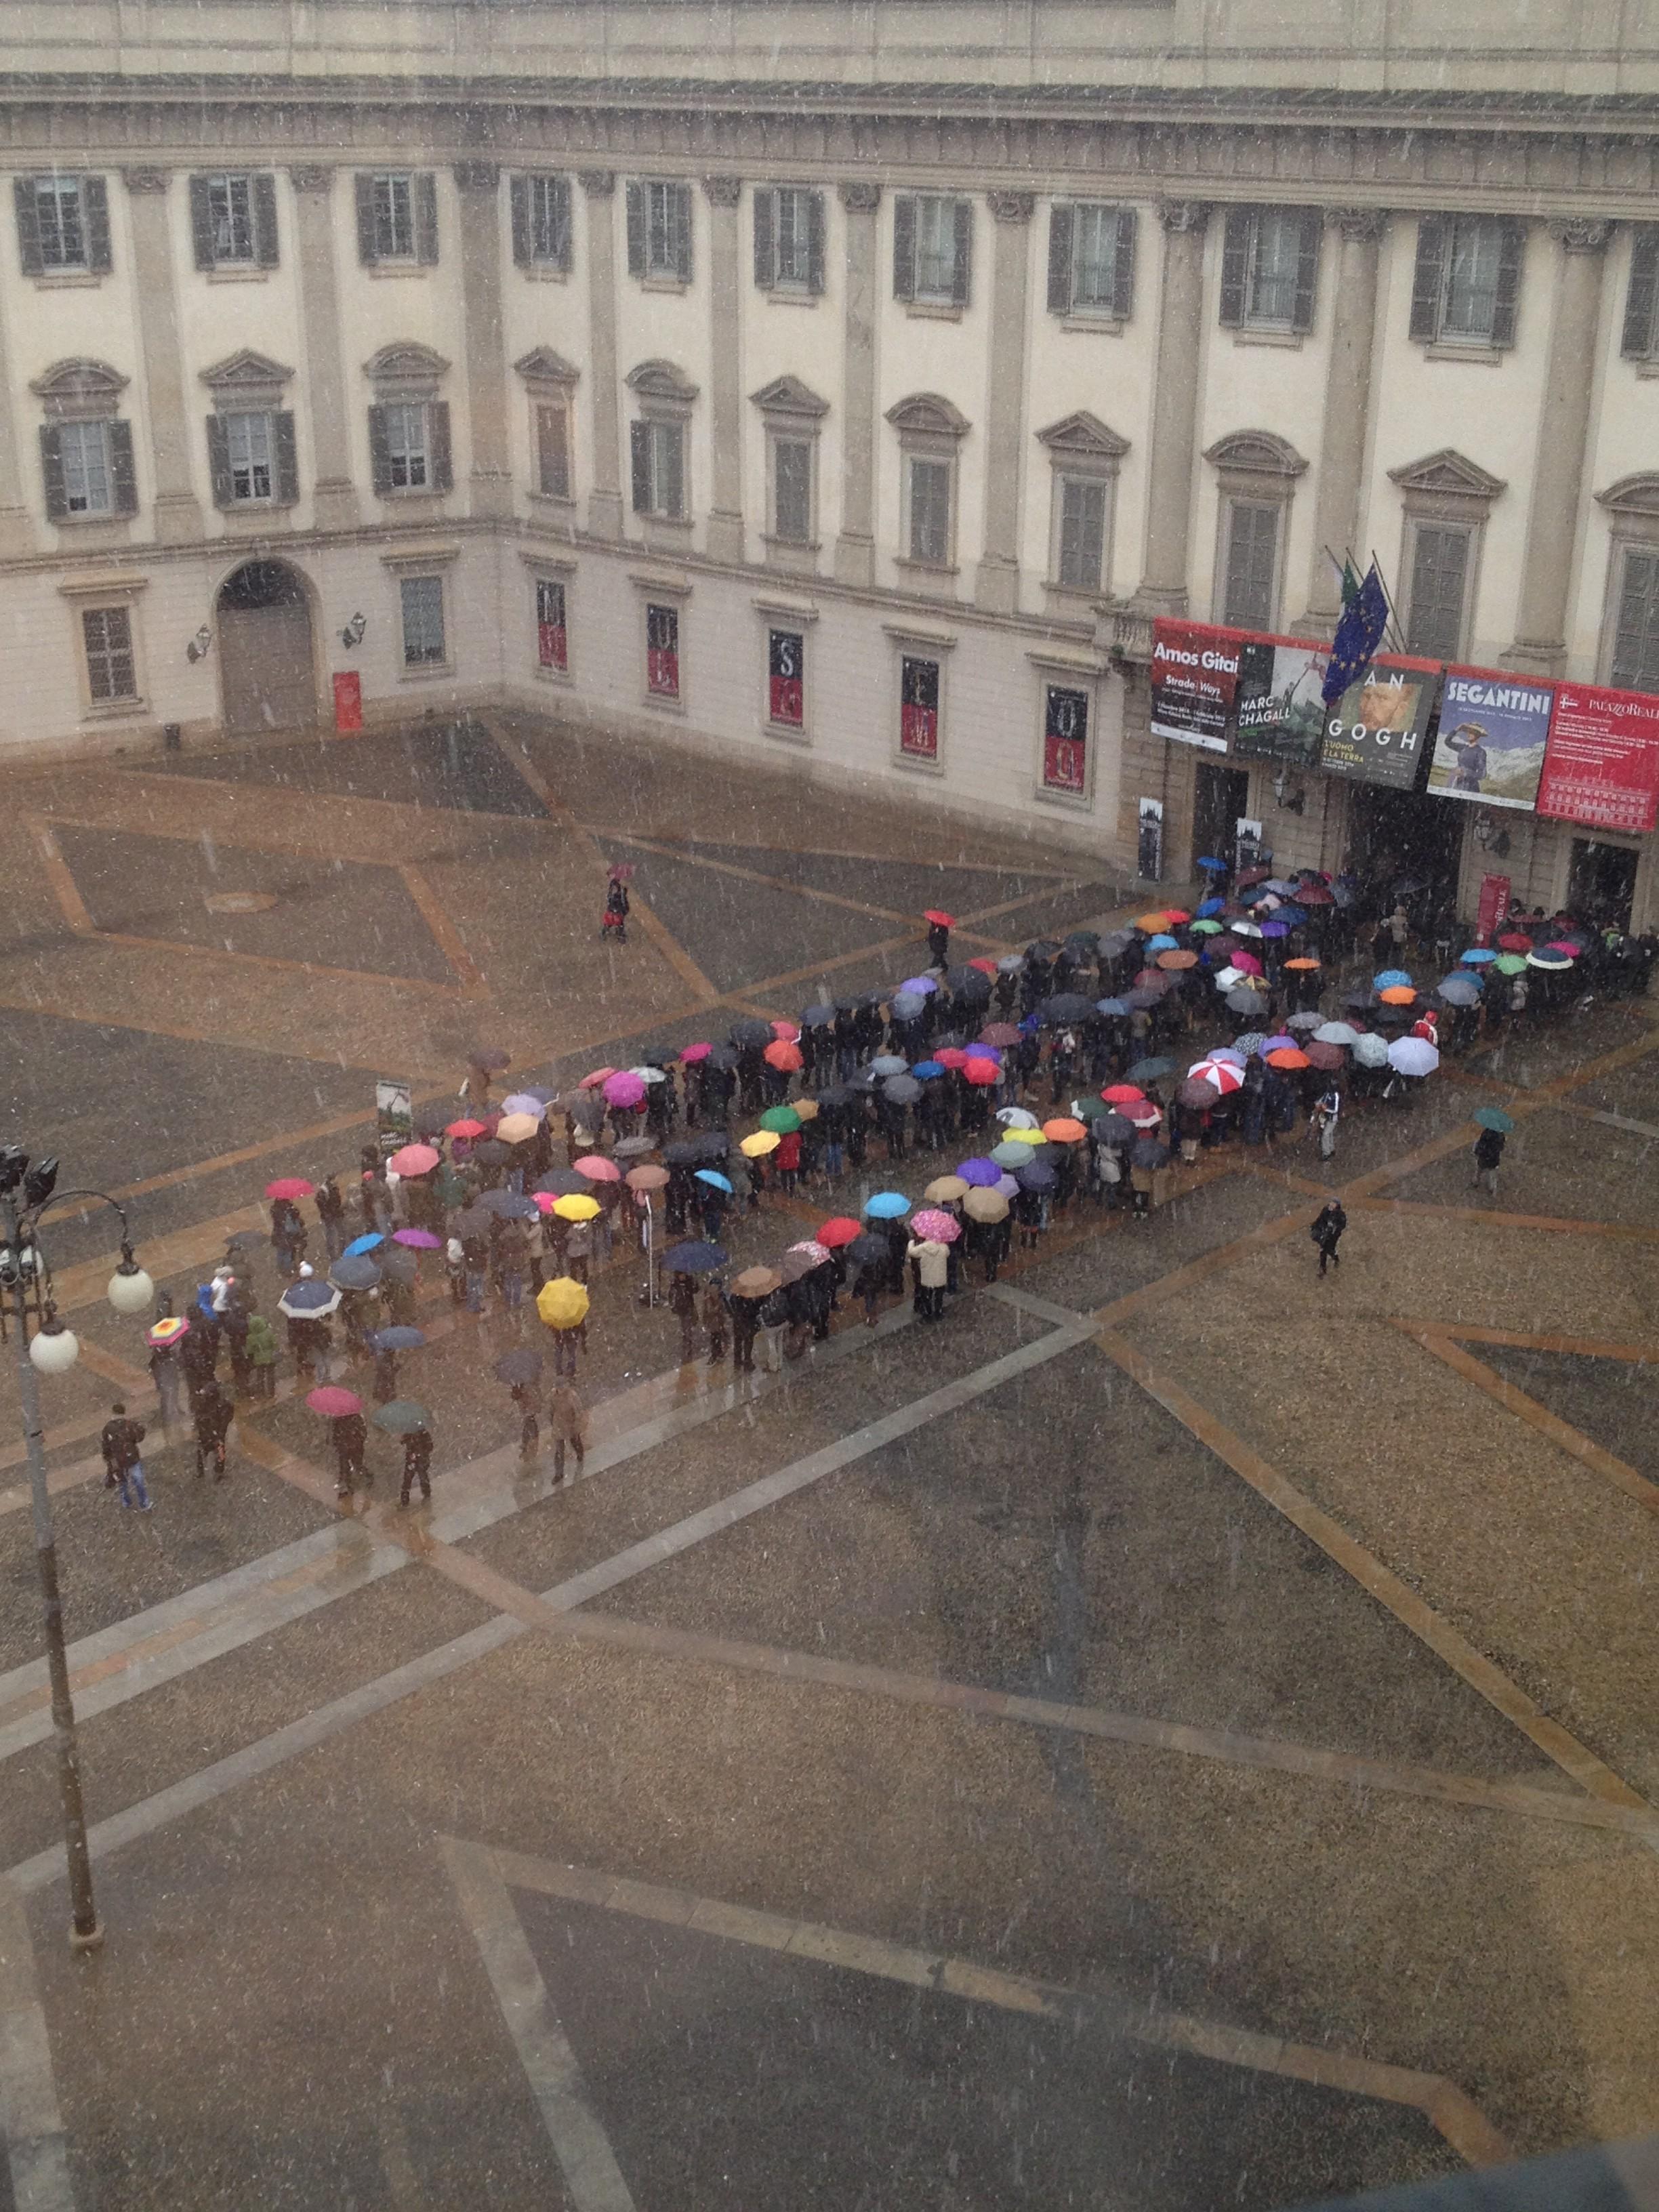 Milan_Umbrellas_Museum (DeenaDanielle)